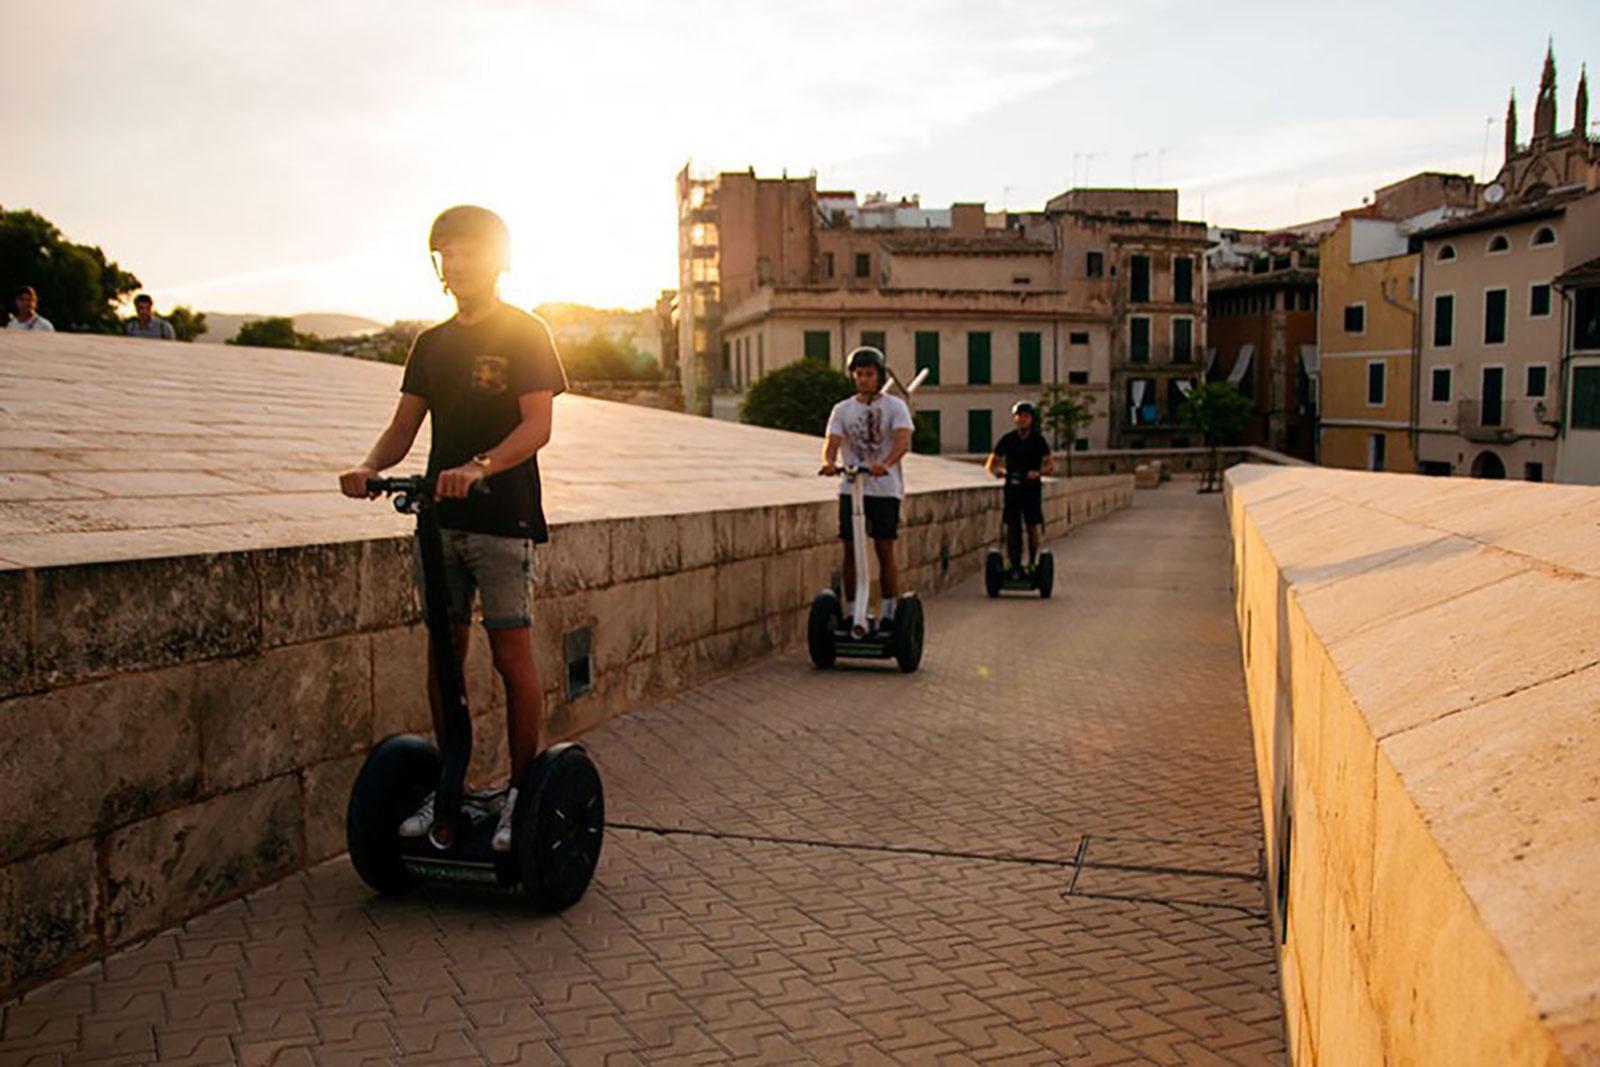 Segway-Palma-Segway-Tour-Palma-Mallorca-Segway-Tour-2